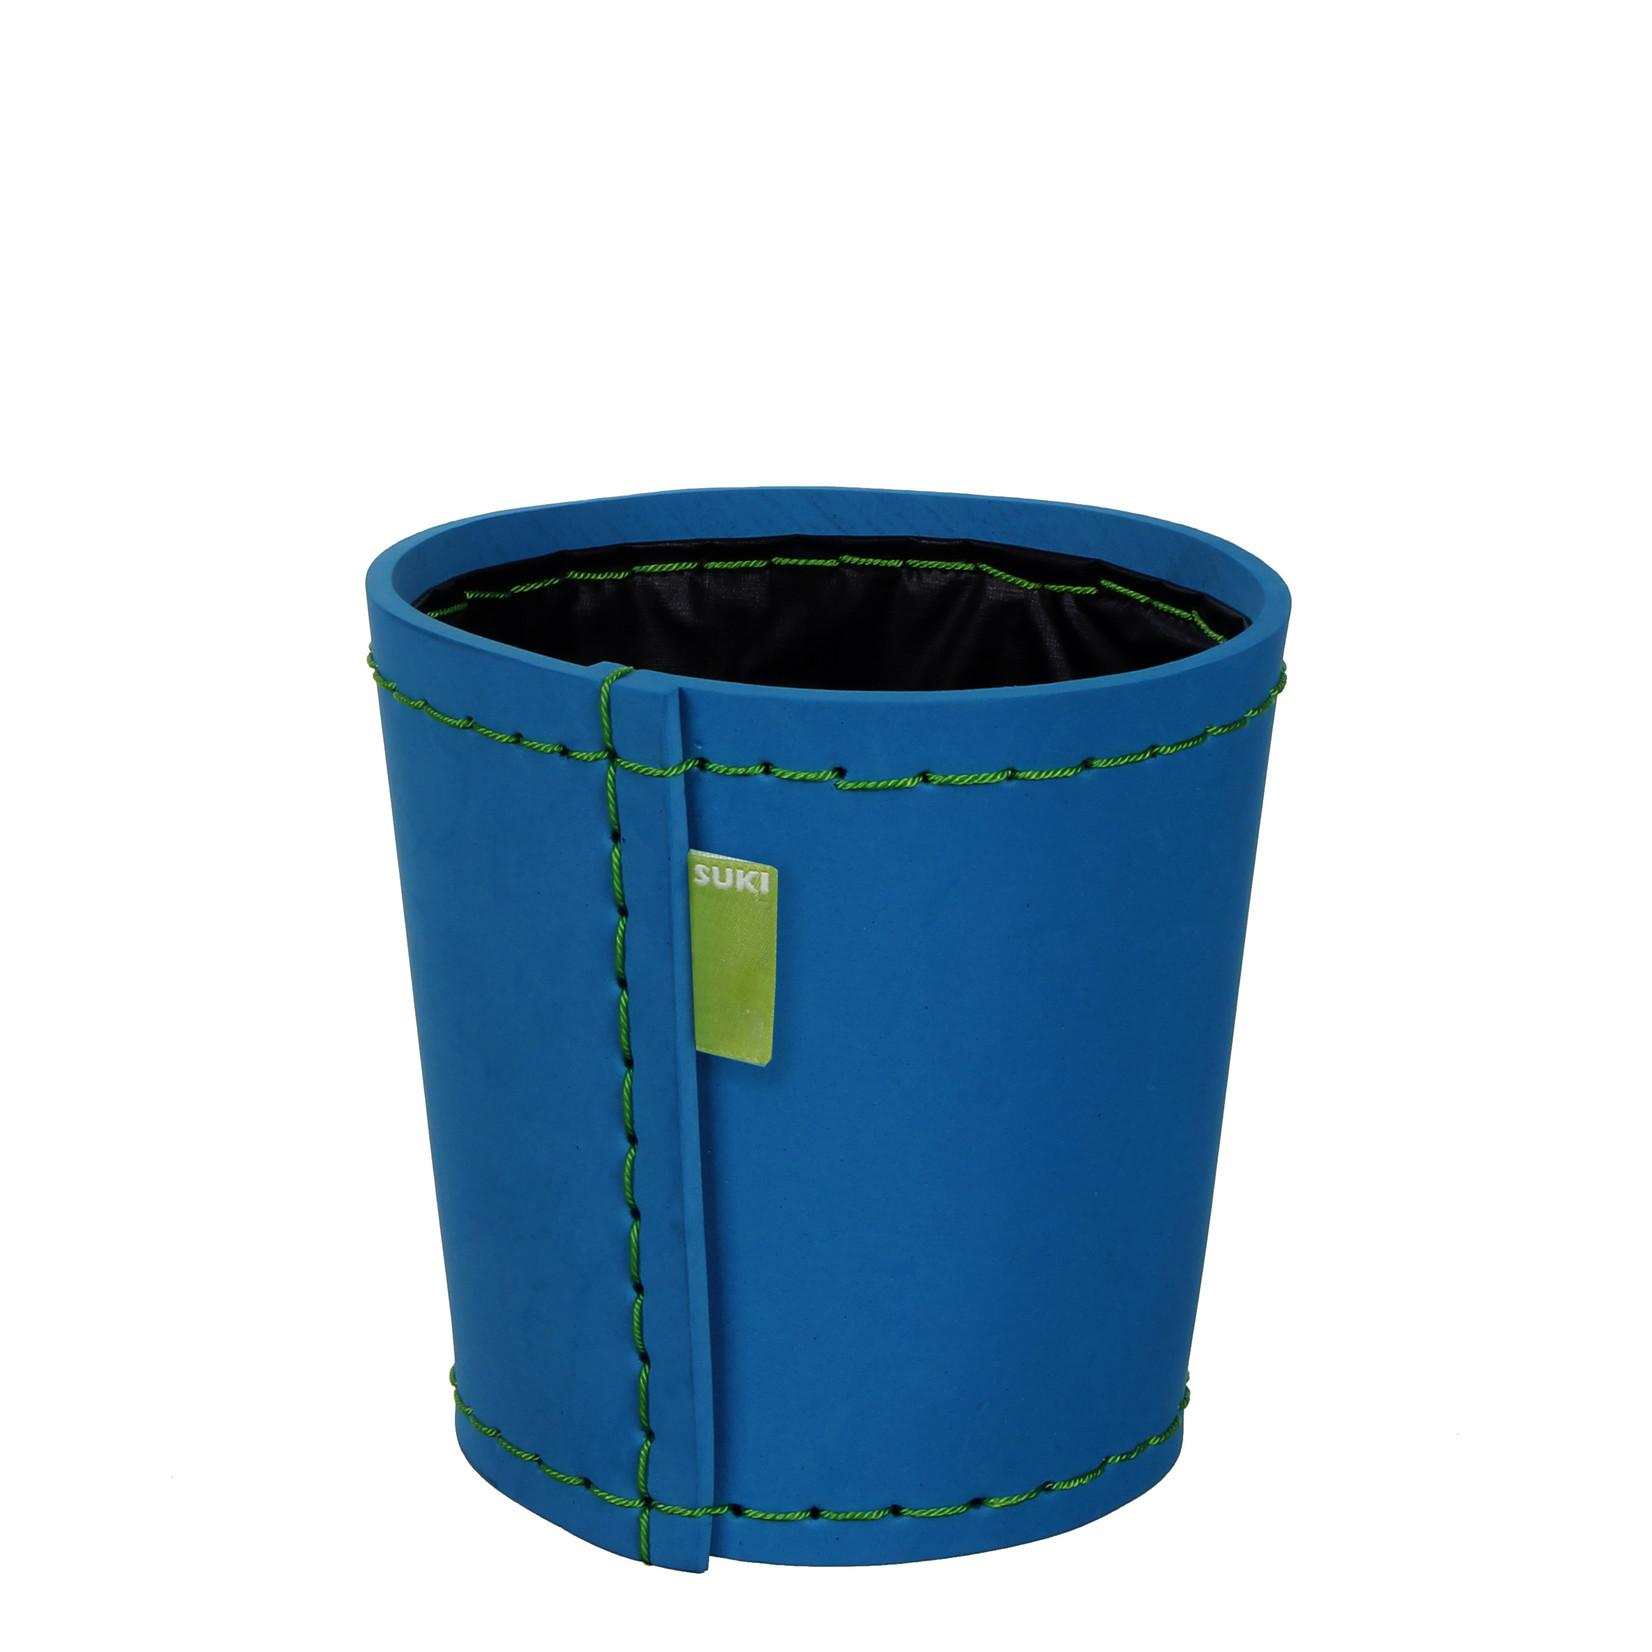 MiCa 153494 Pot around Suki Blue